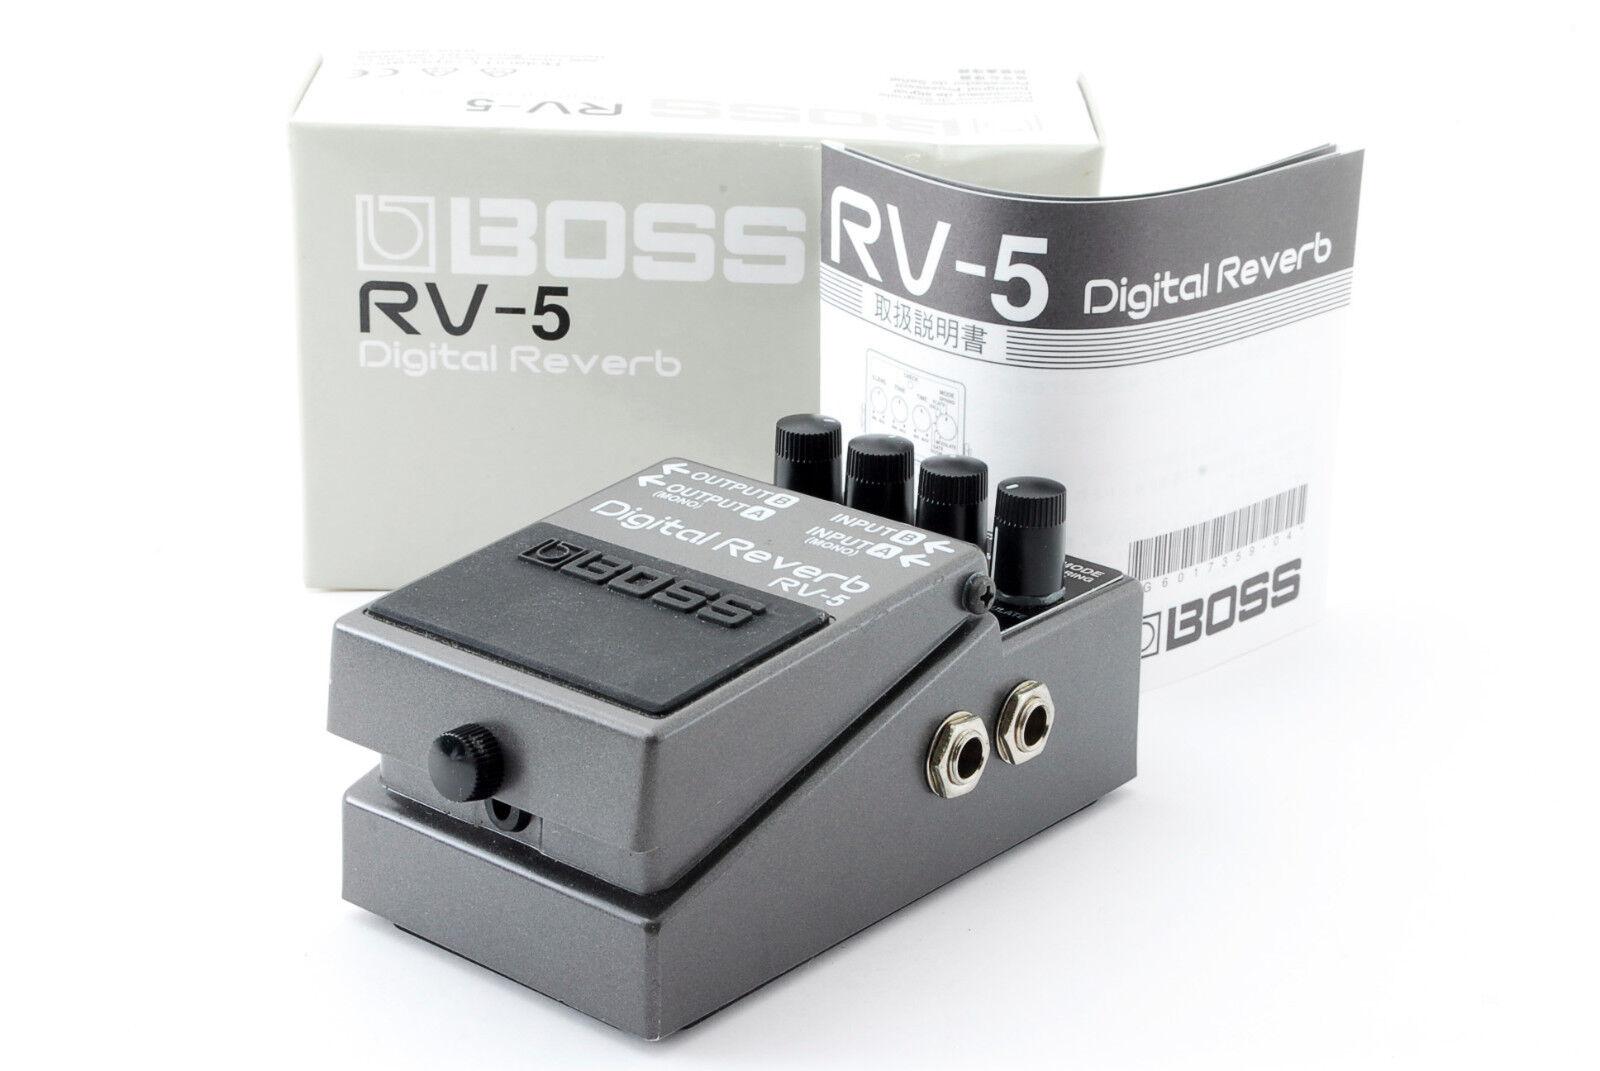 BOSS RV-5 Digital Reverb w Box,Manual  Effect Pedal Used In Japan A600